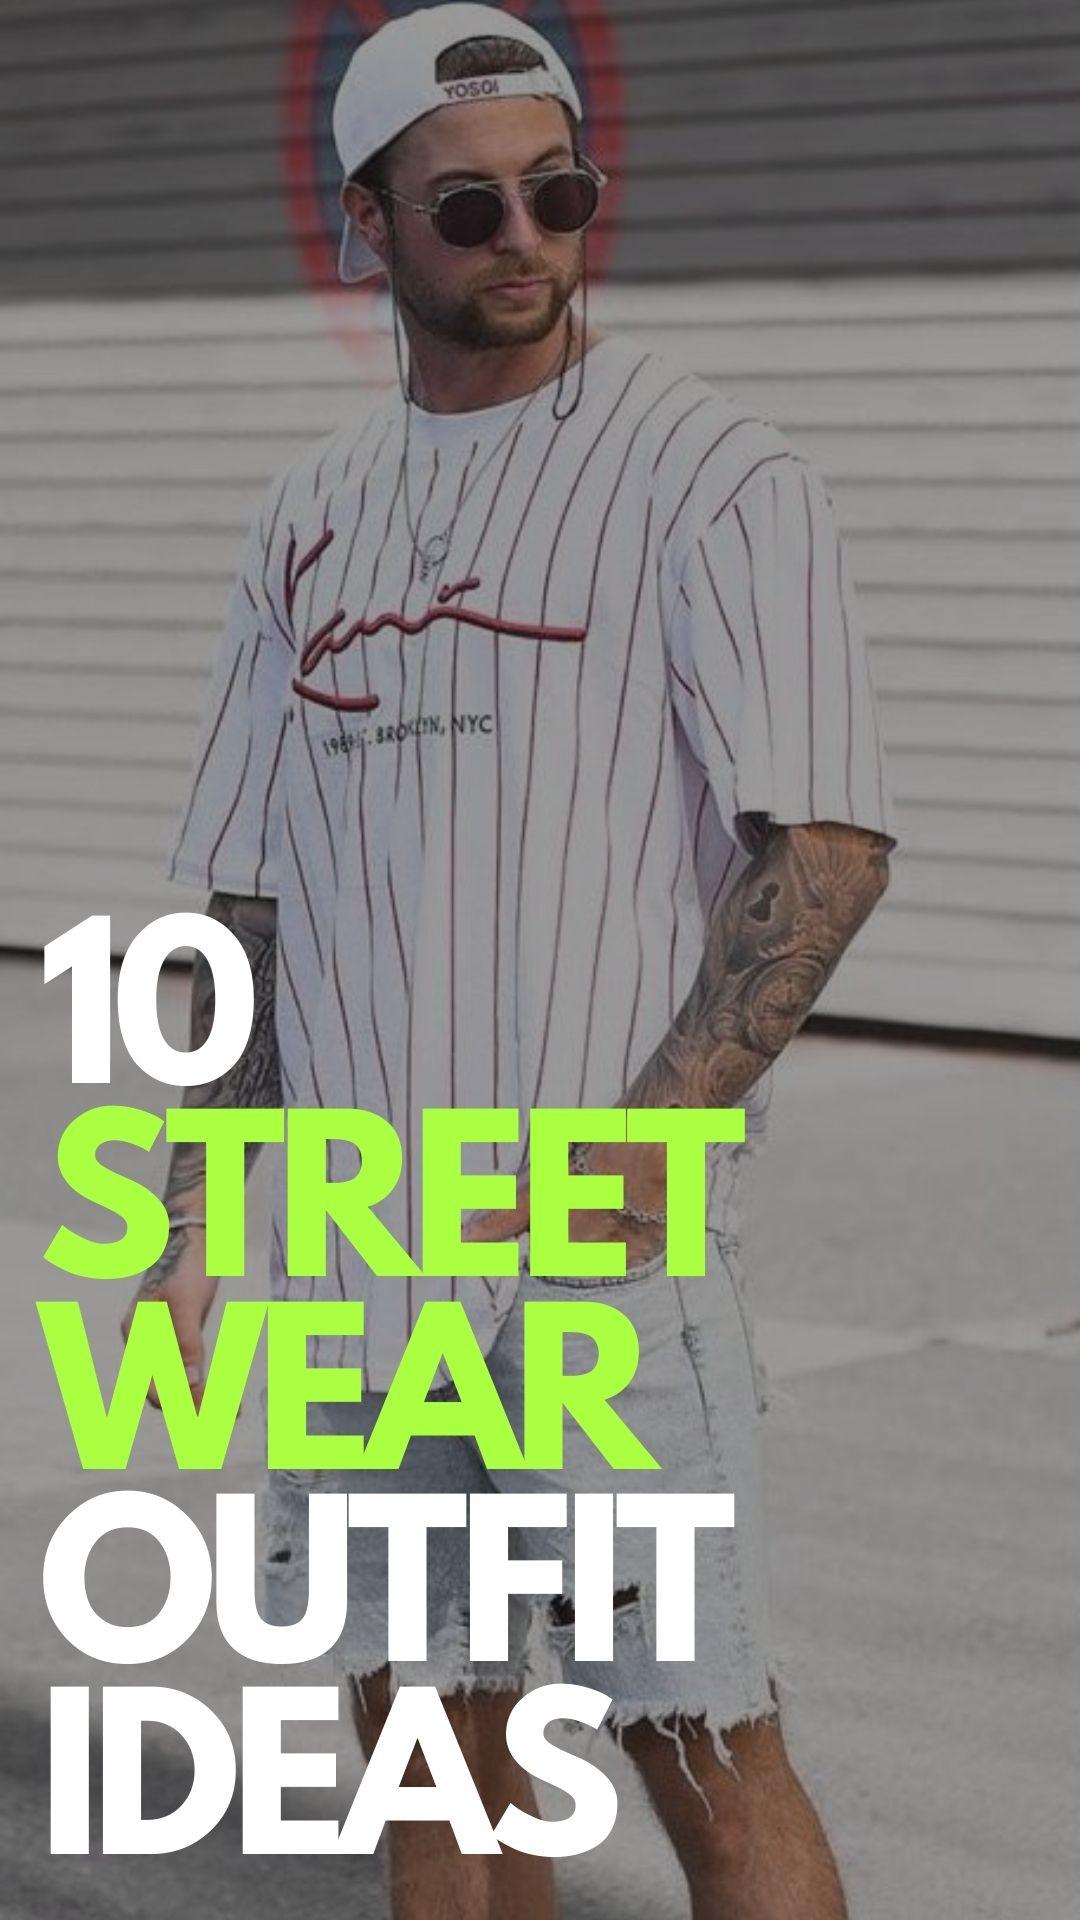 10 Streetwear Fashion Outfits